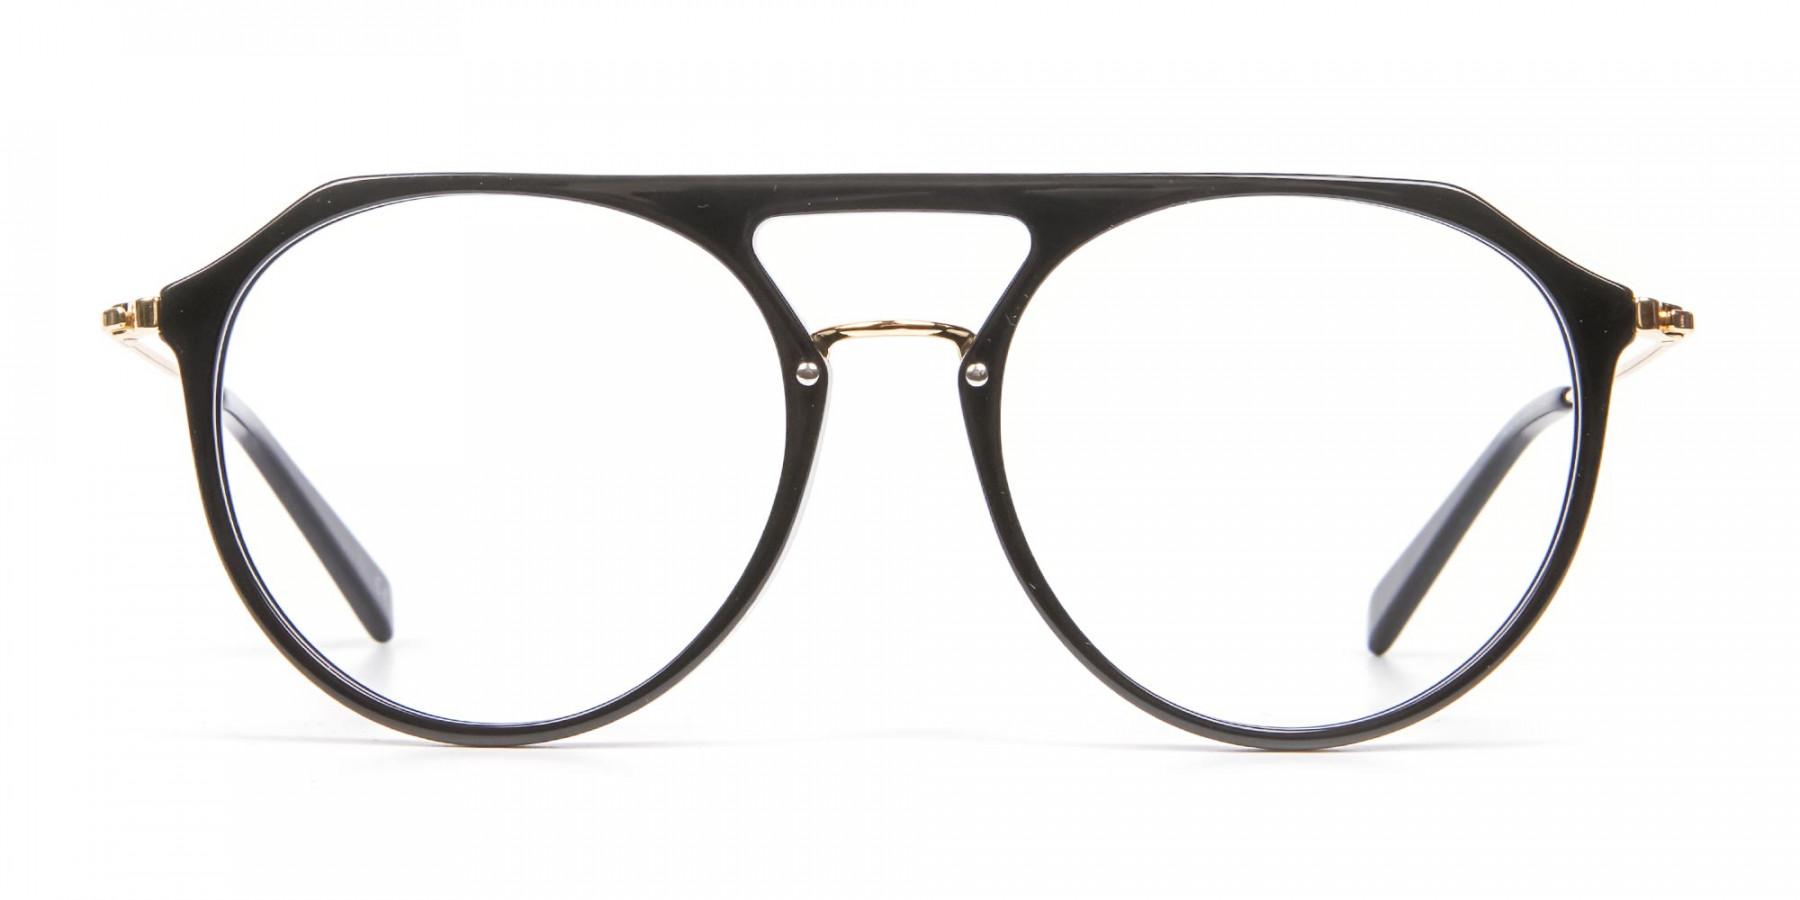 Delicate Designer Double-Bridged Glasses in Black and Gold - 1